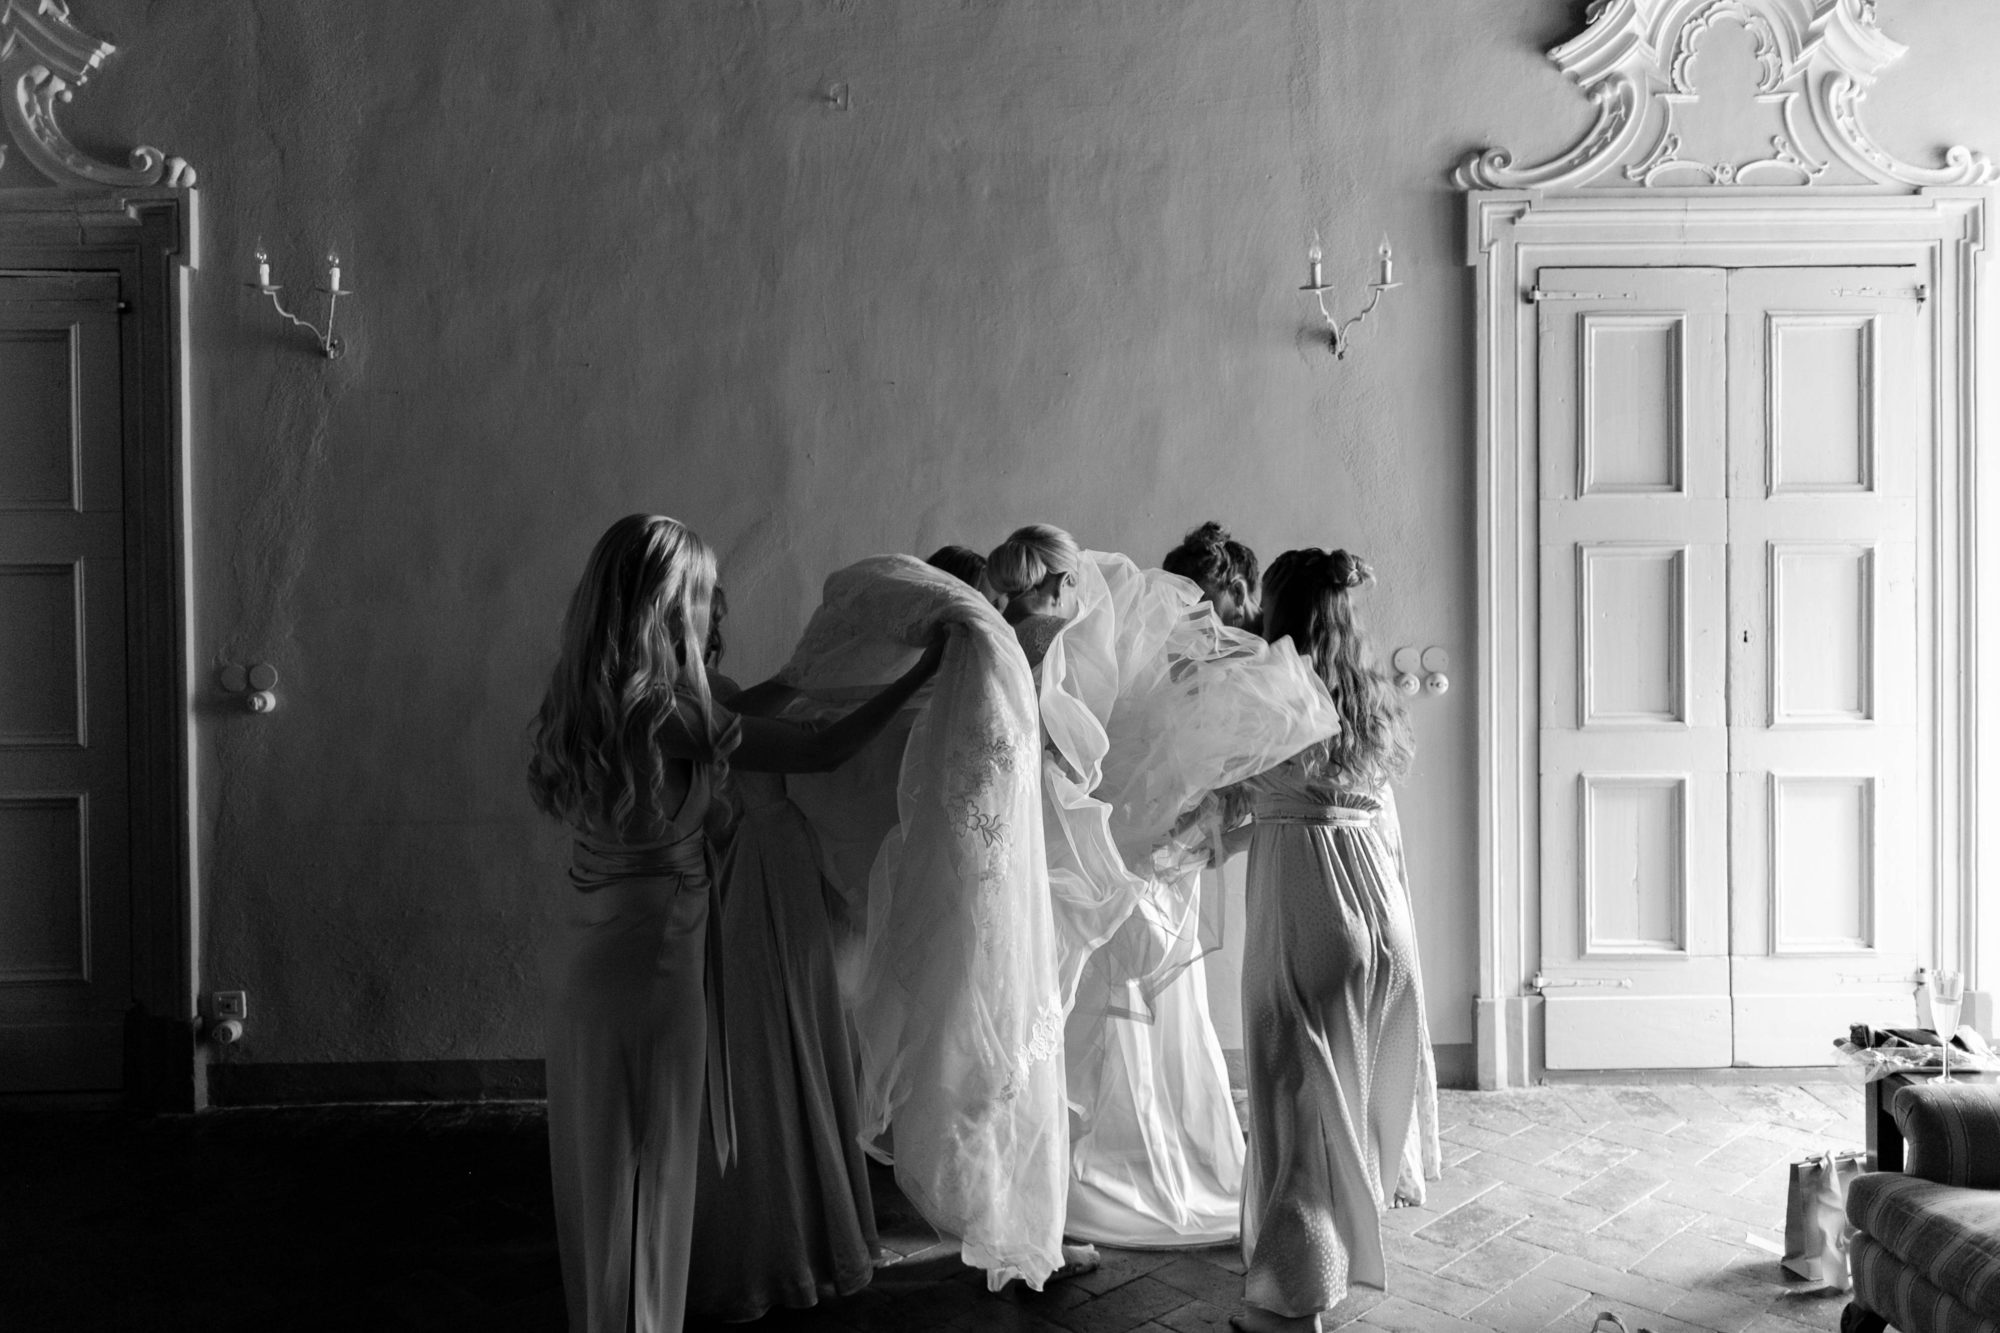 09_gilbertiricca_castellooldofredi_2019